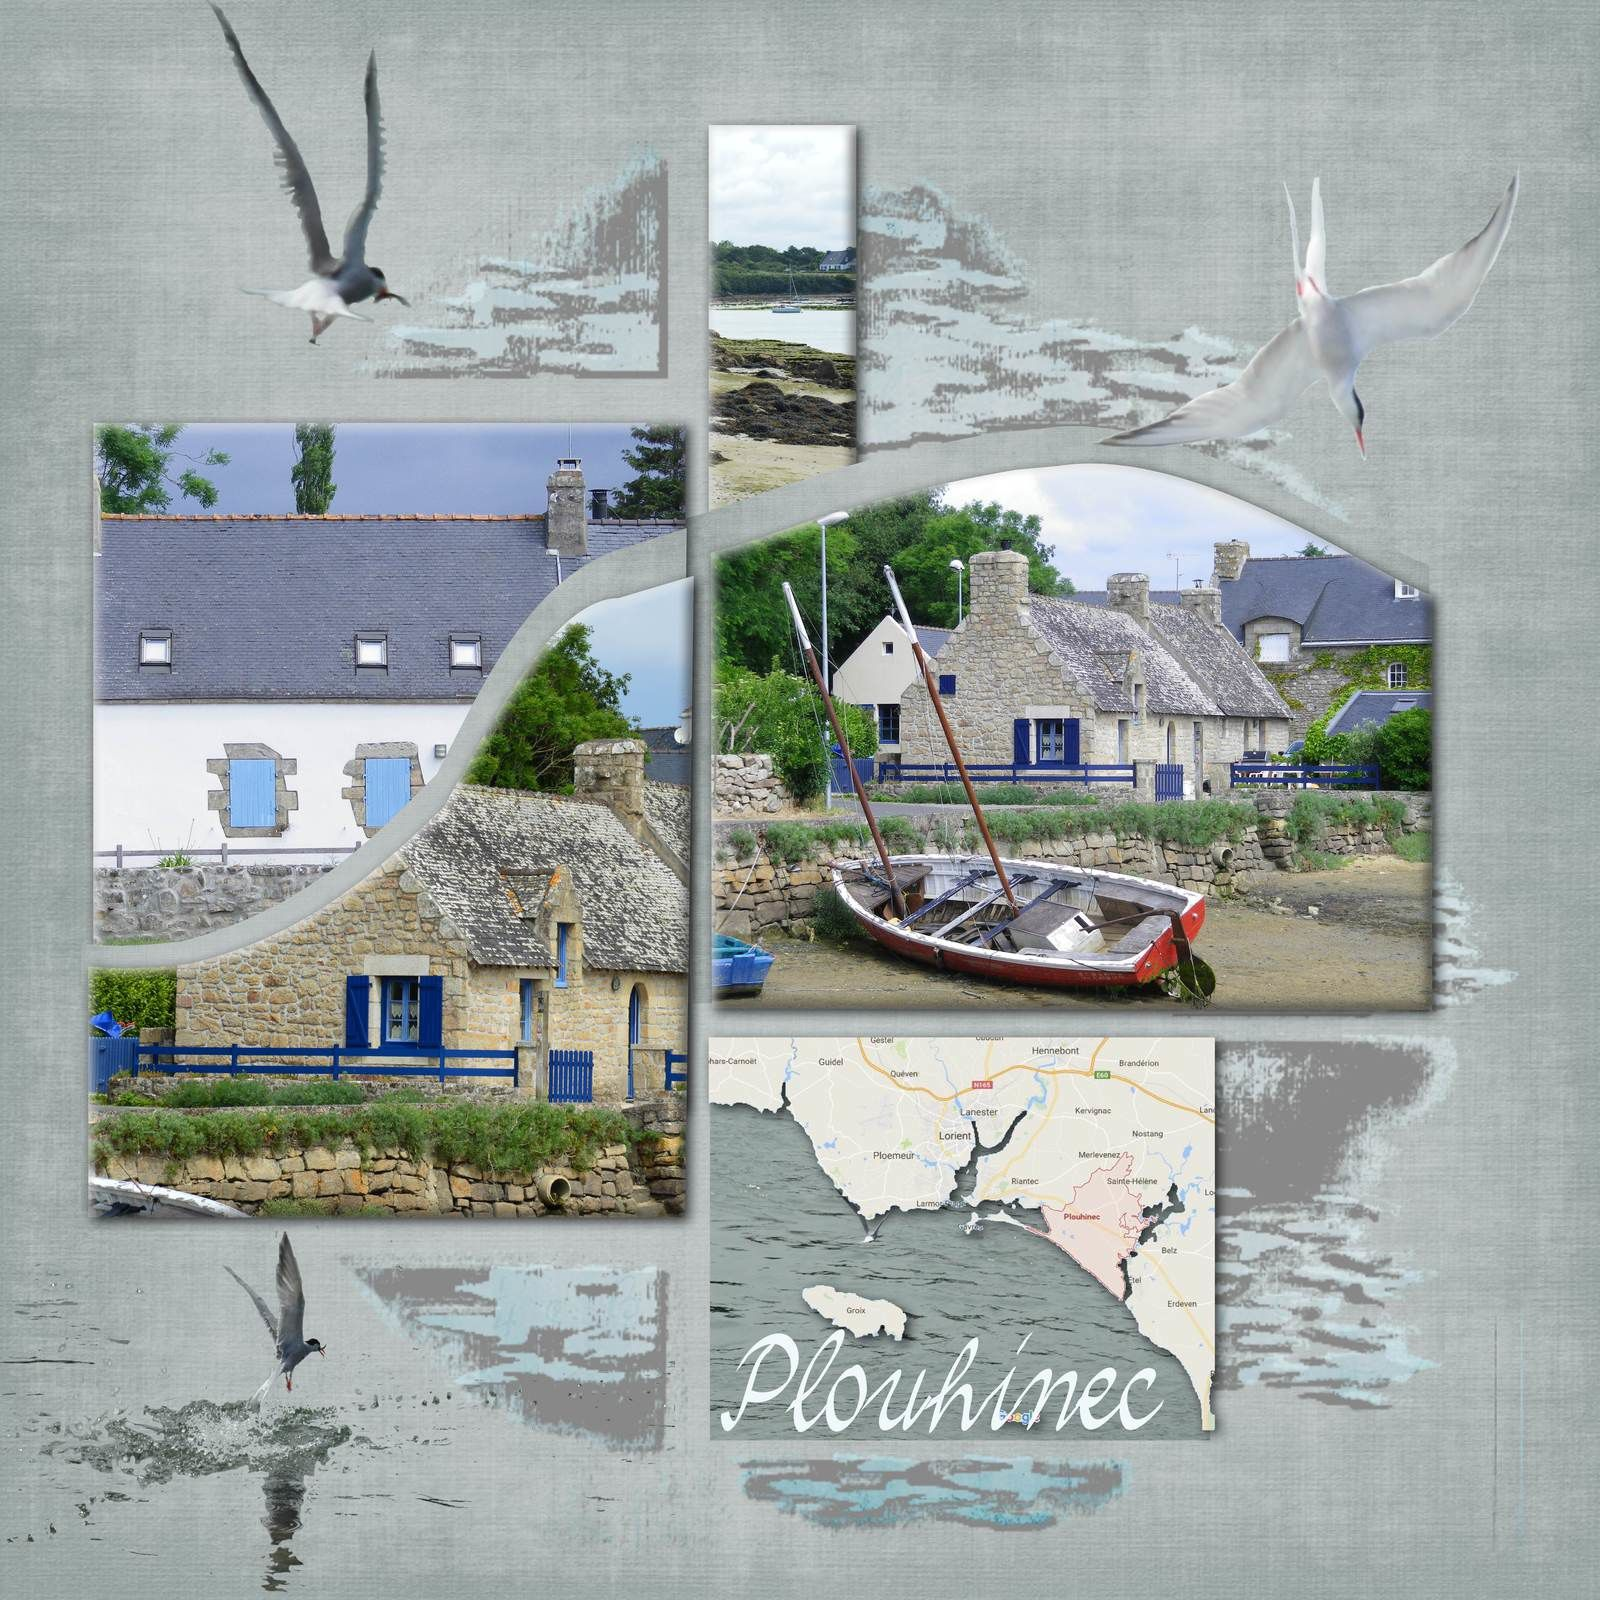 PLOUHINEC - Morbihan